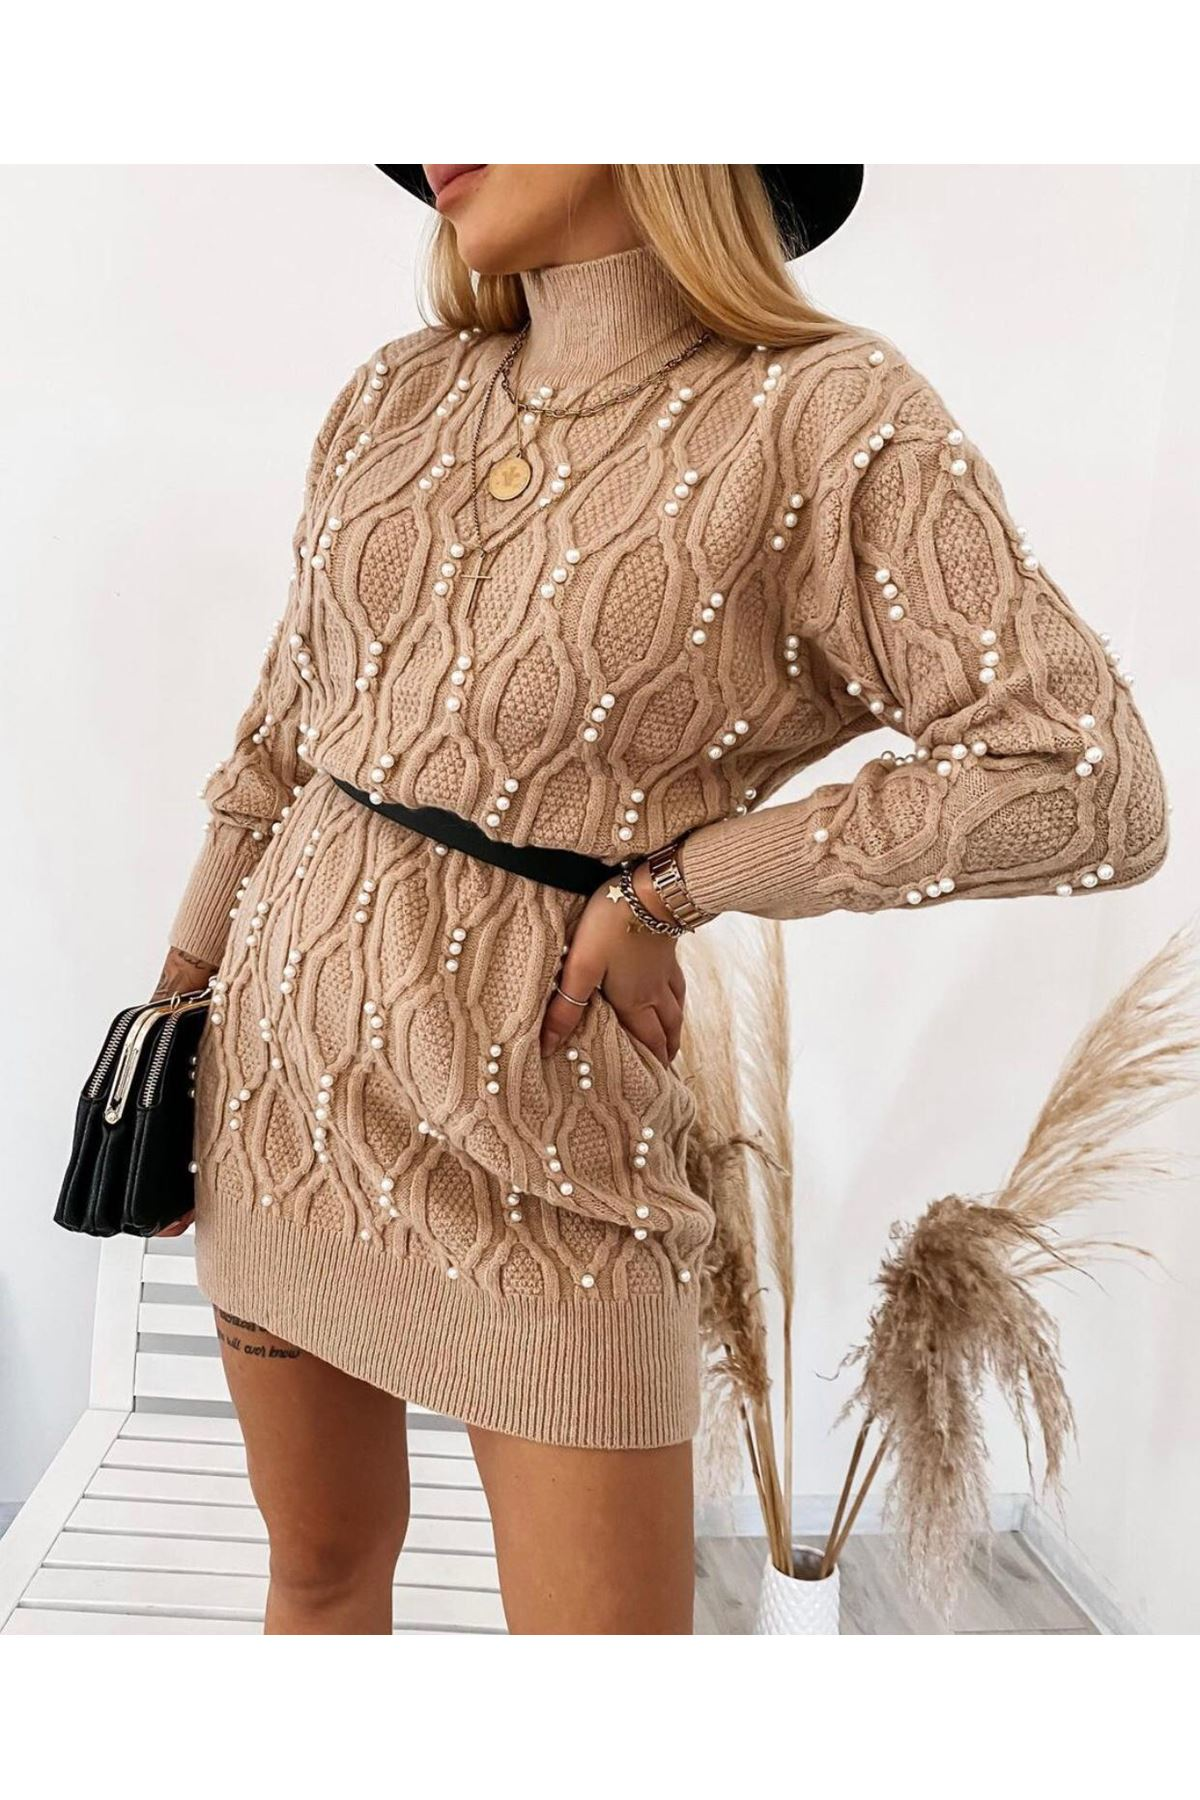 İnci Detay Mini Elbise  - VİZON